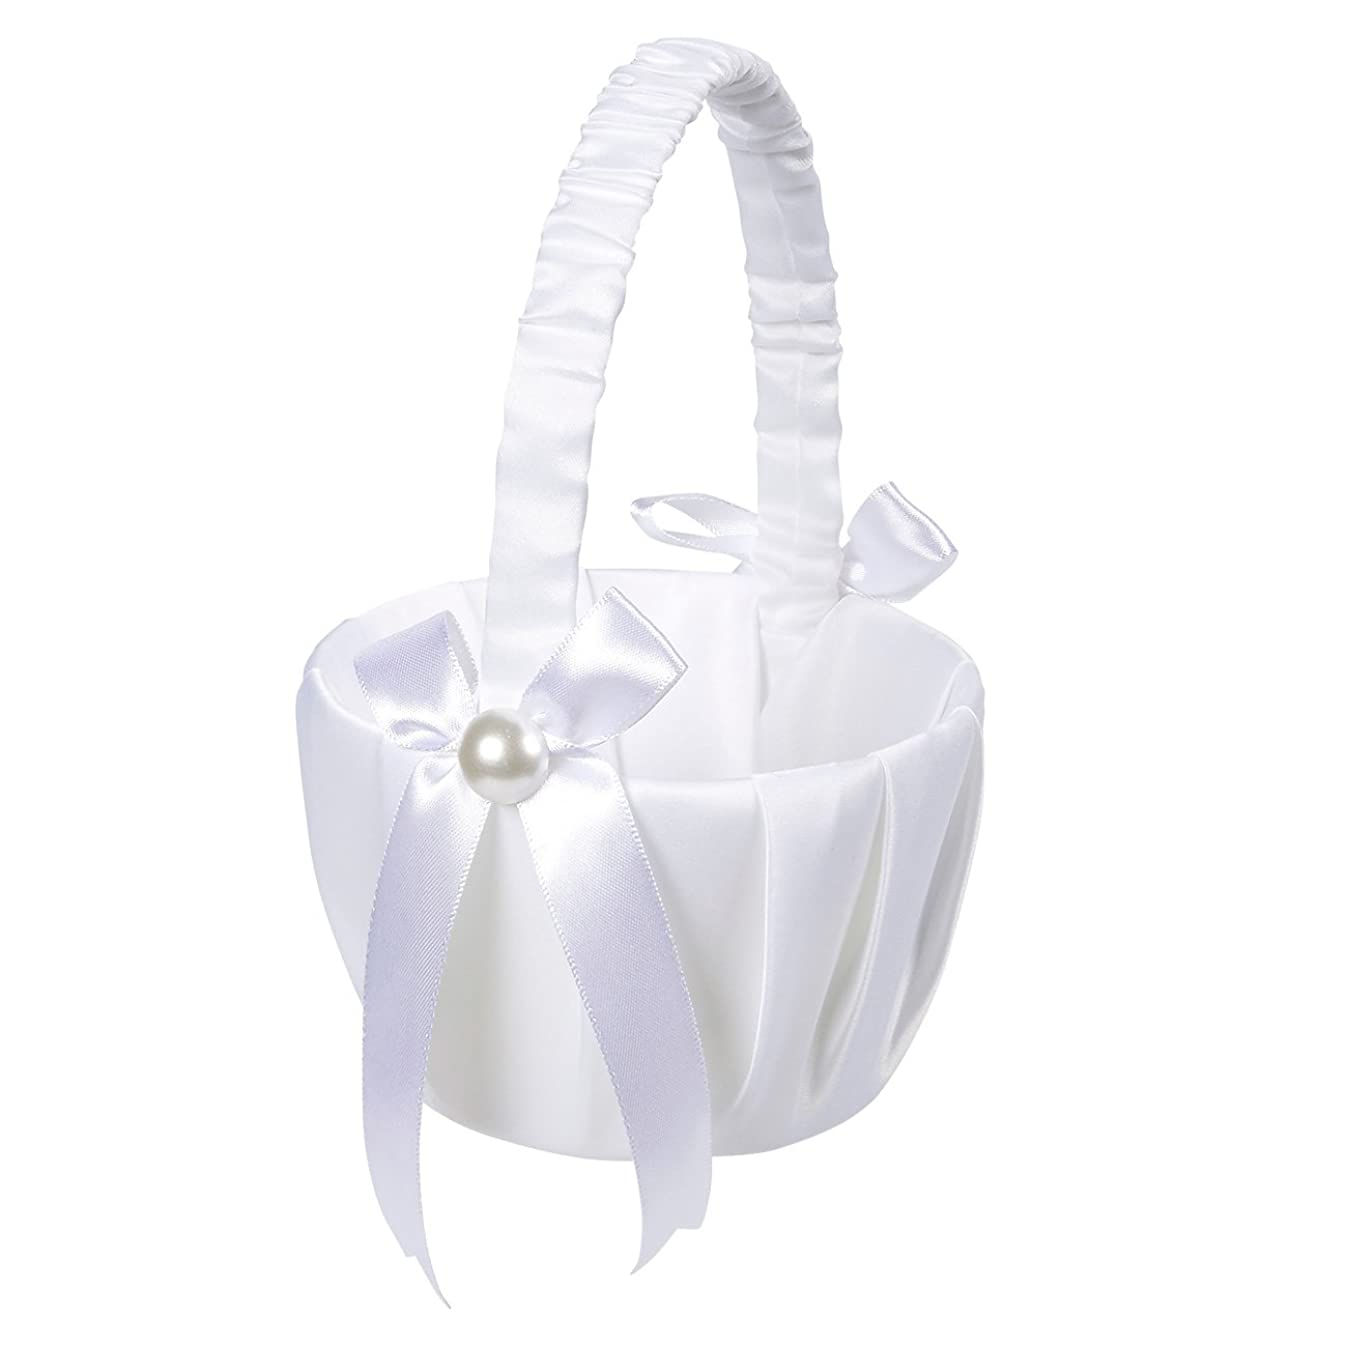 Juvale Flower Girl Basket – White Flower Basket, Wedding Basket Matrimony Processions, Cute Satin Holder Rose Petals, Reception Decoration, White, 8.7 x 5.2 x 4.2 inches